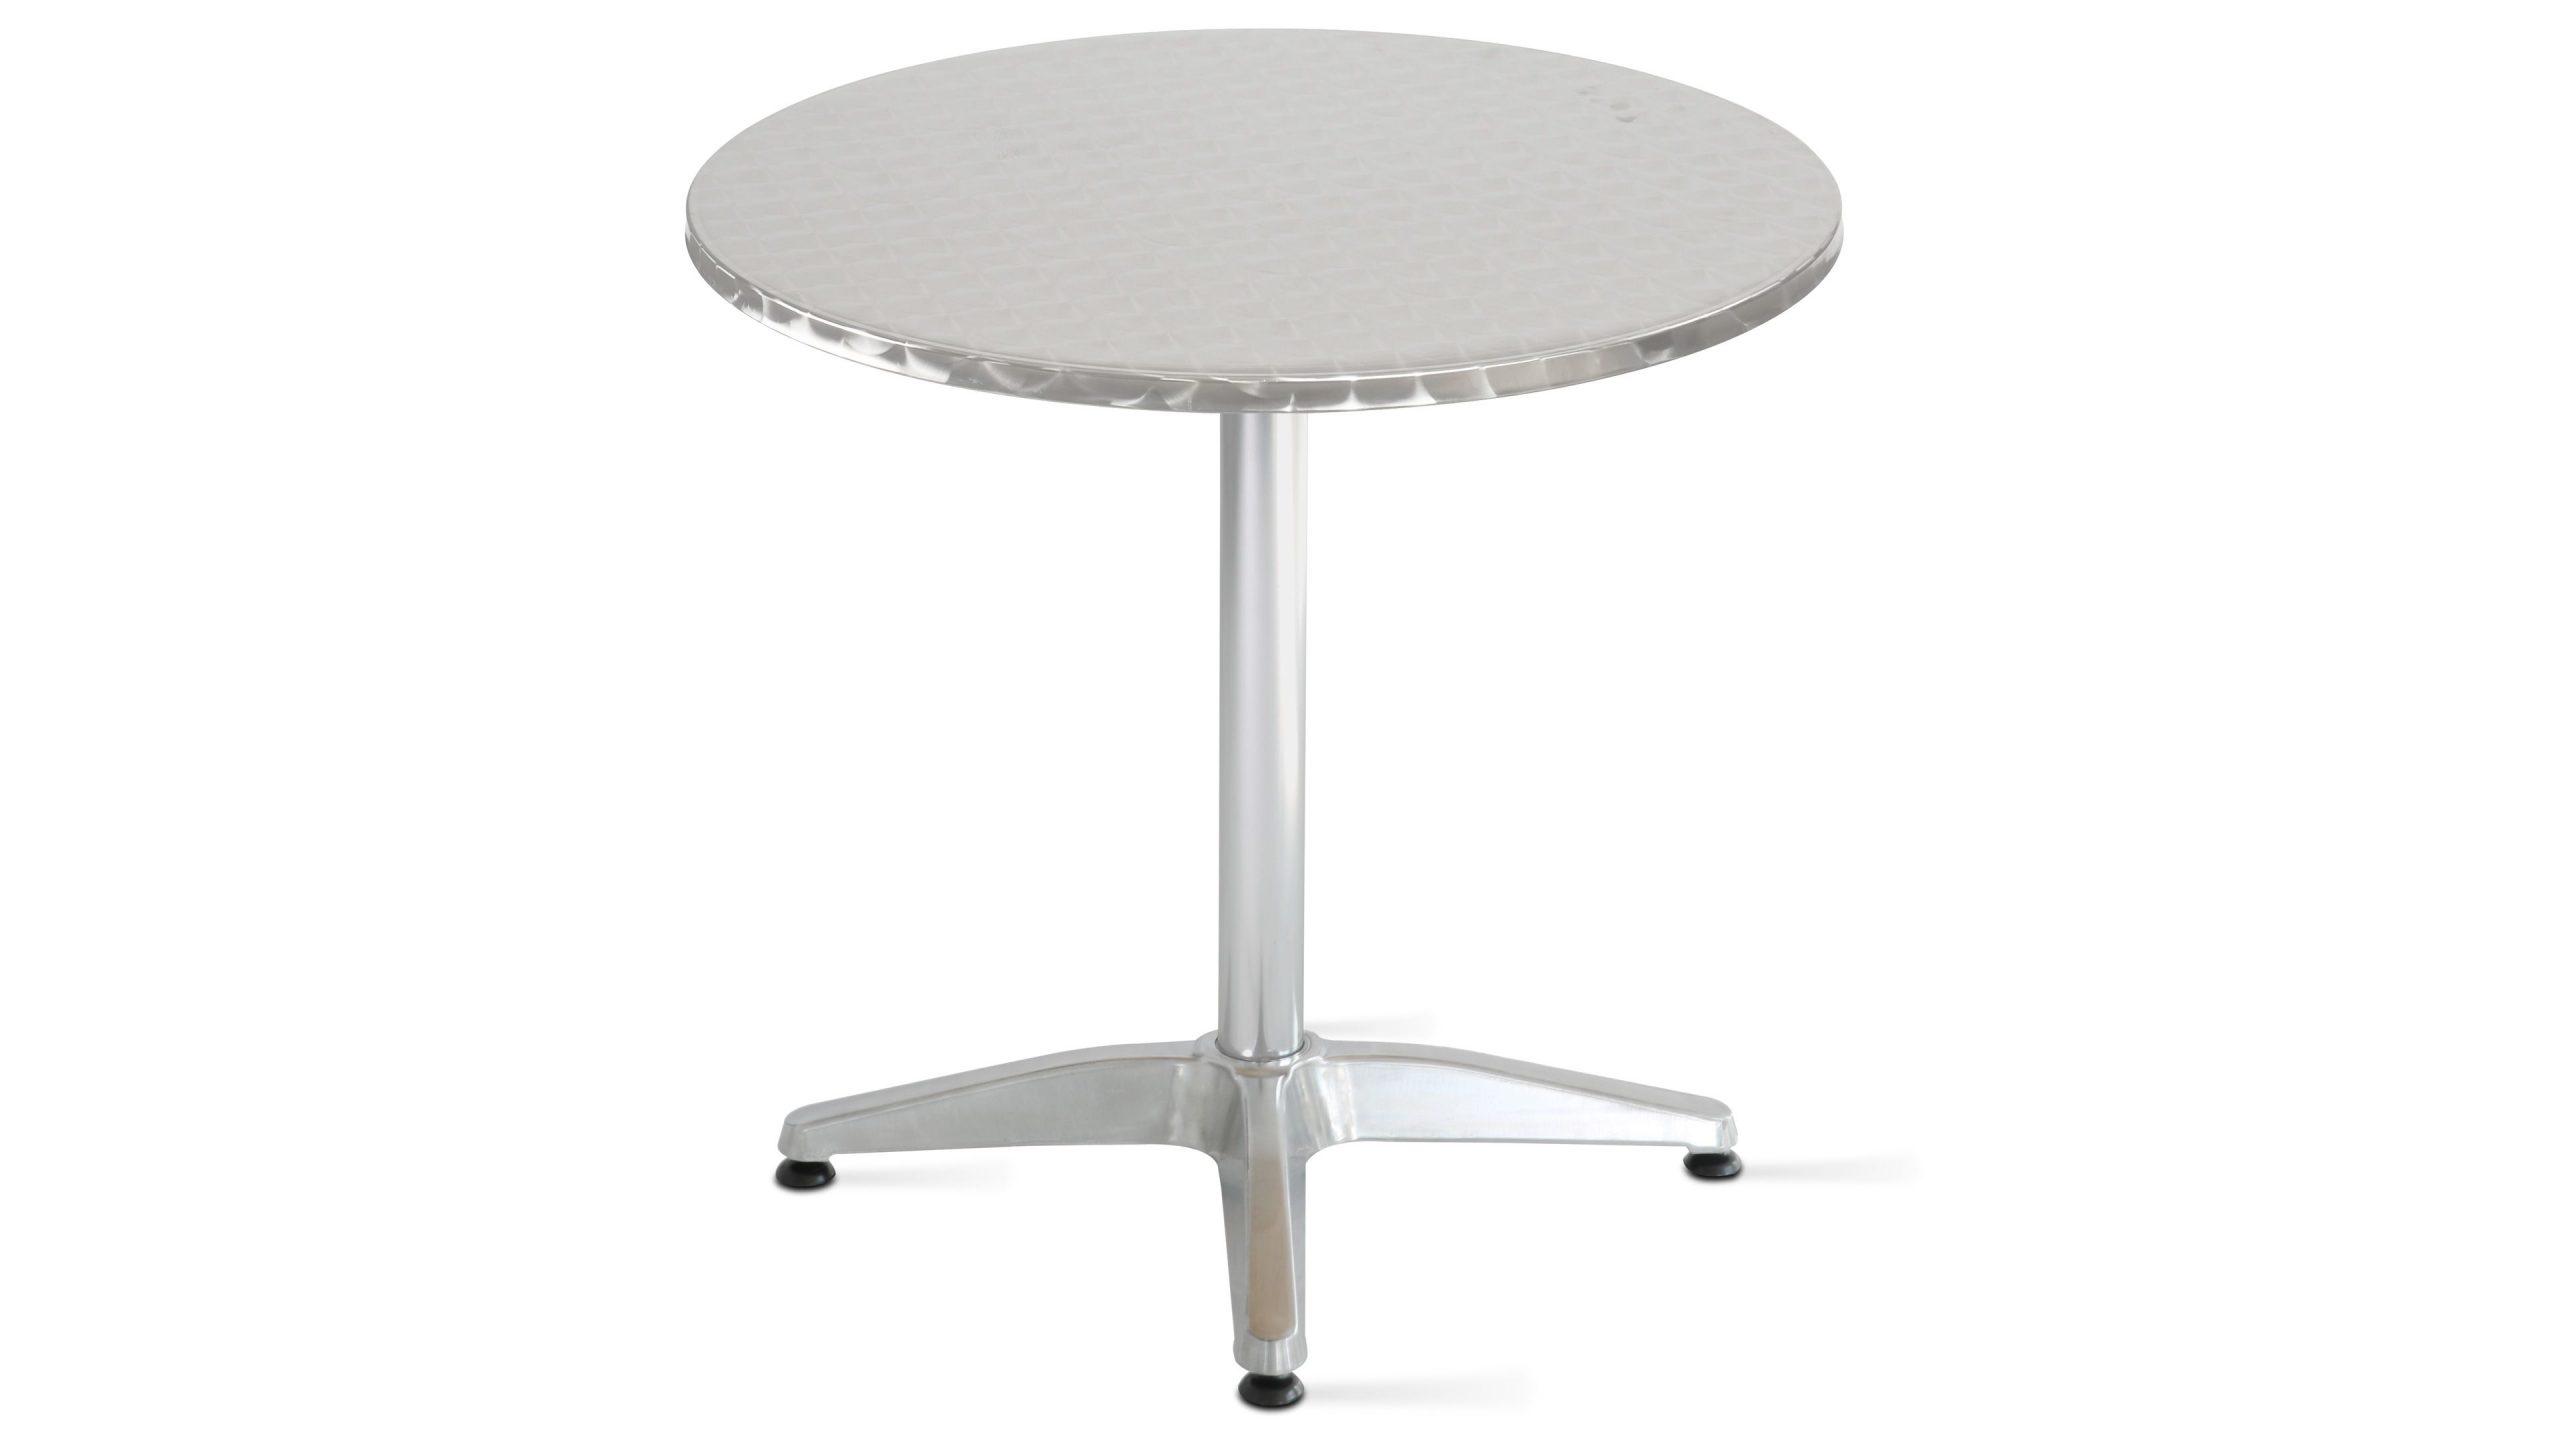 Table Ronde De Jardin En Aluminium avec Table Ronde Jardin Pas Cher